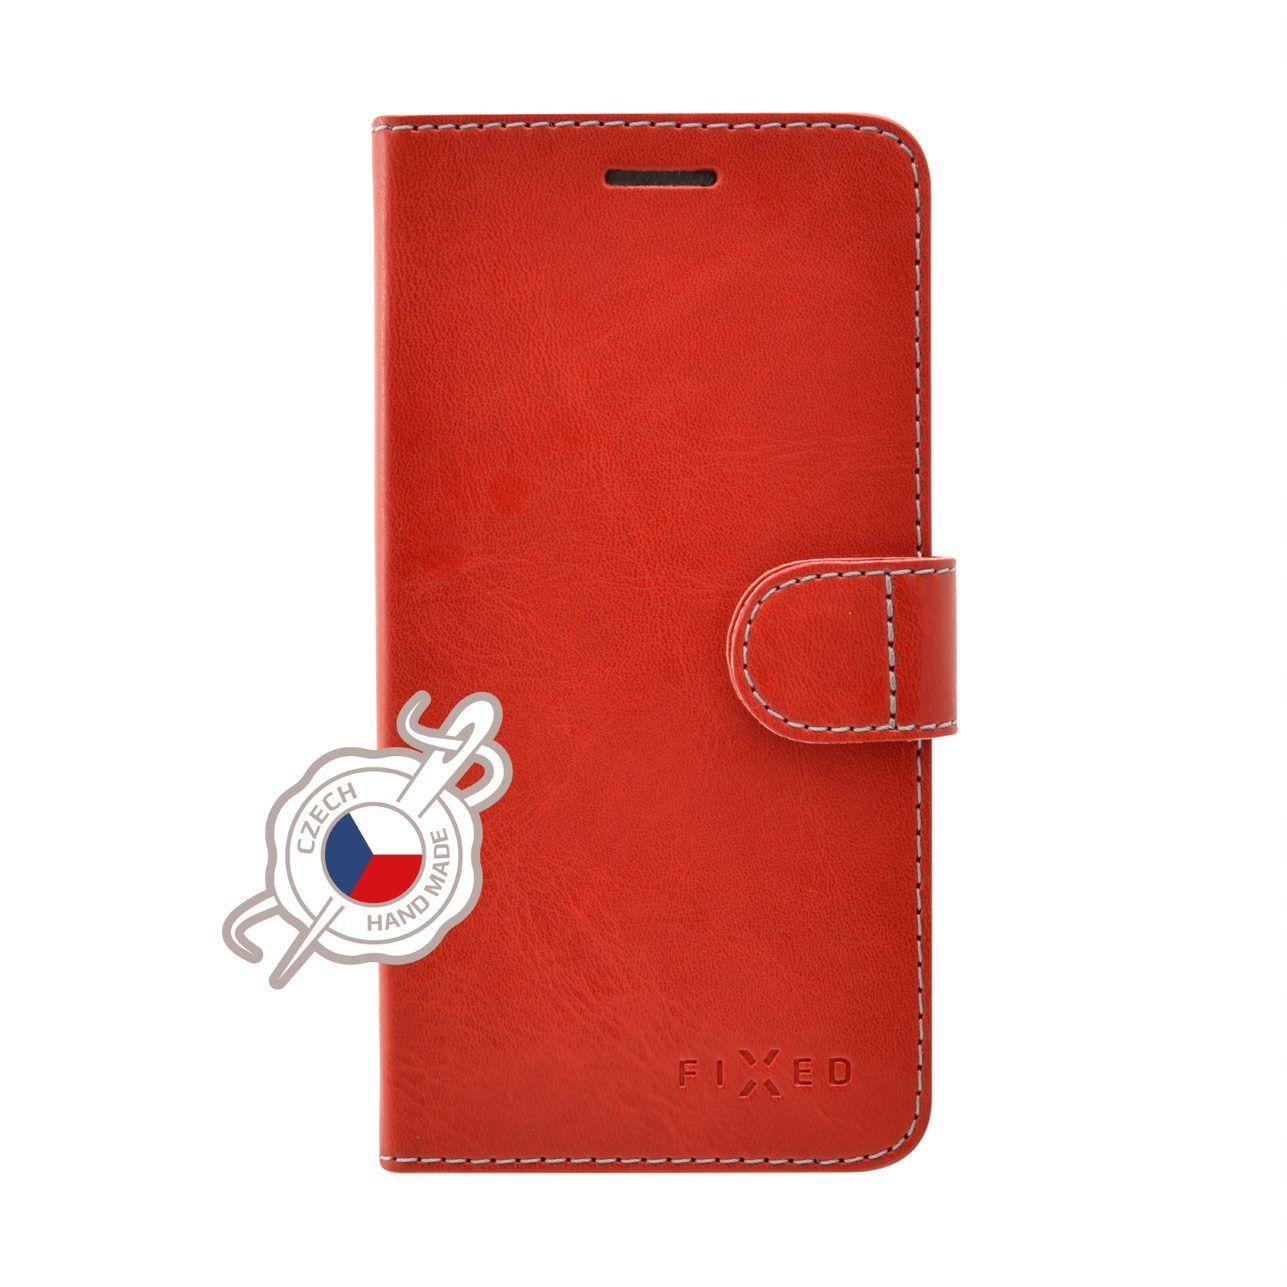 Pouzdro typu kniha FIXED FIT pro Samsung Galaxy A7 (2018), červené